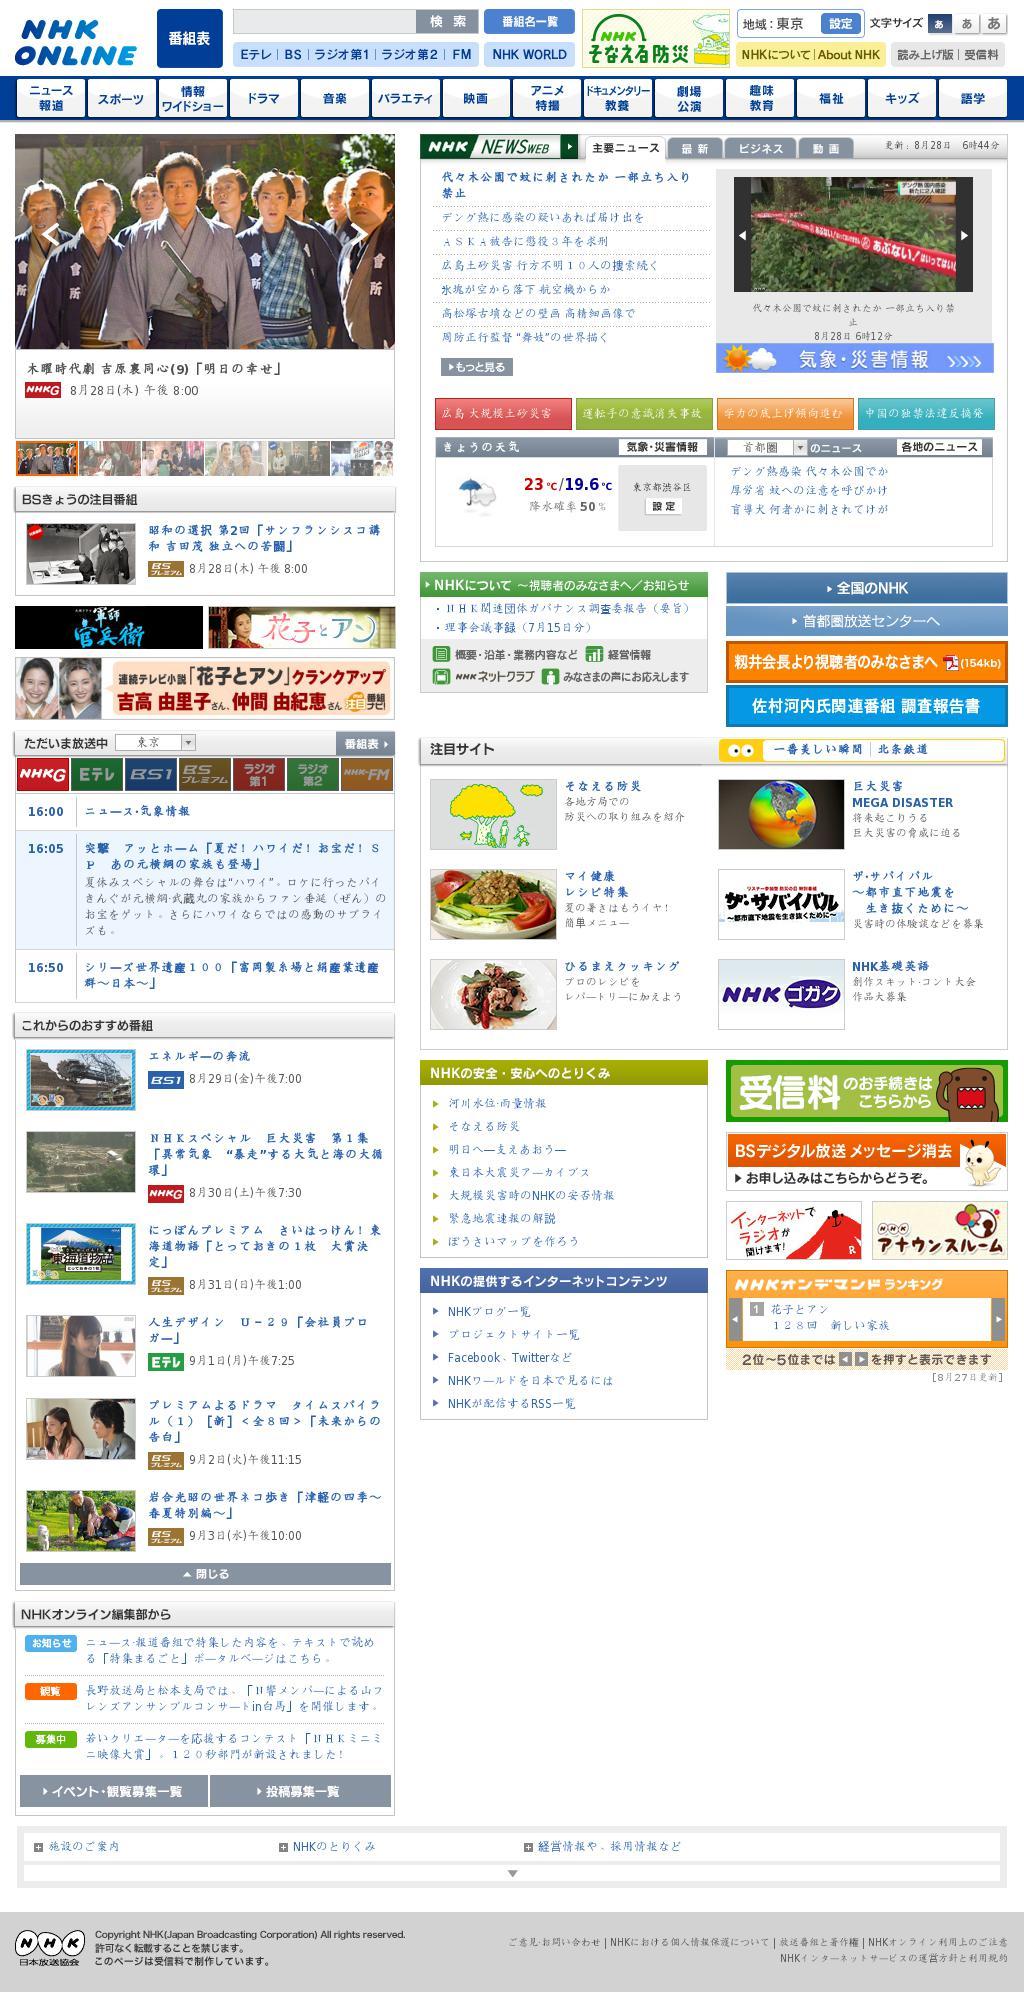 NHK Online at Thursday Aug. 28, 2014, 7:12 a.m. UTC